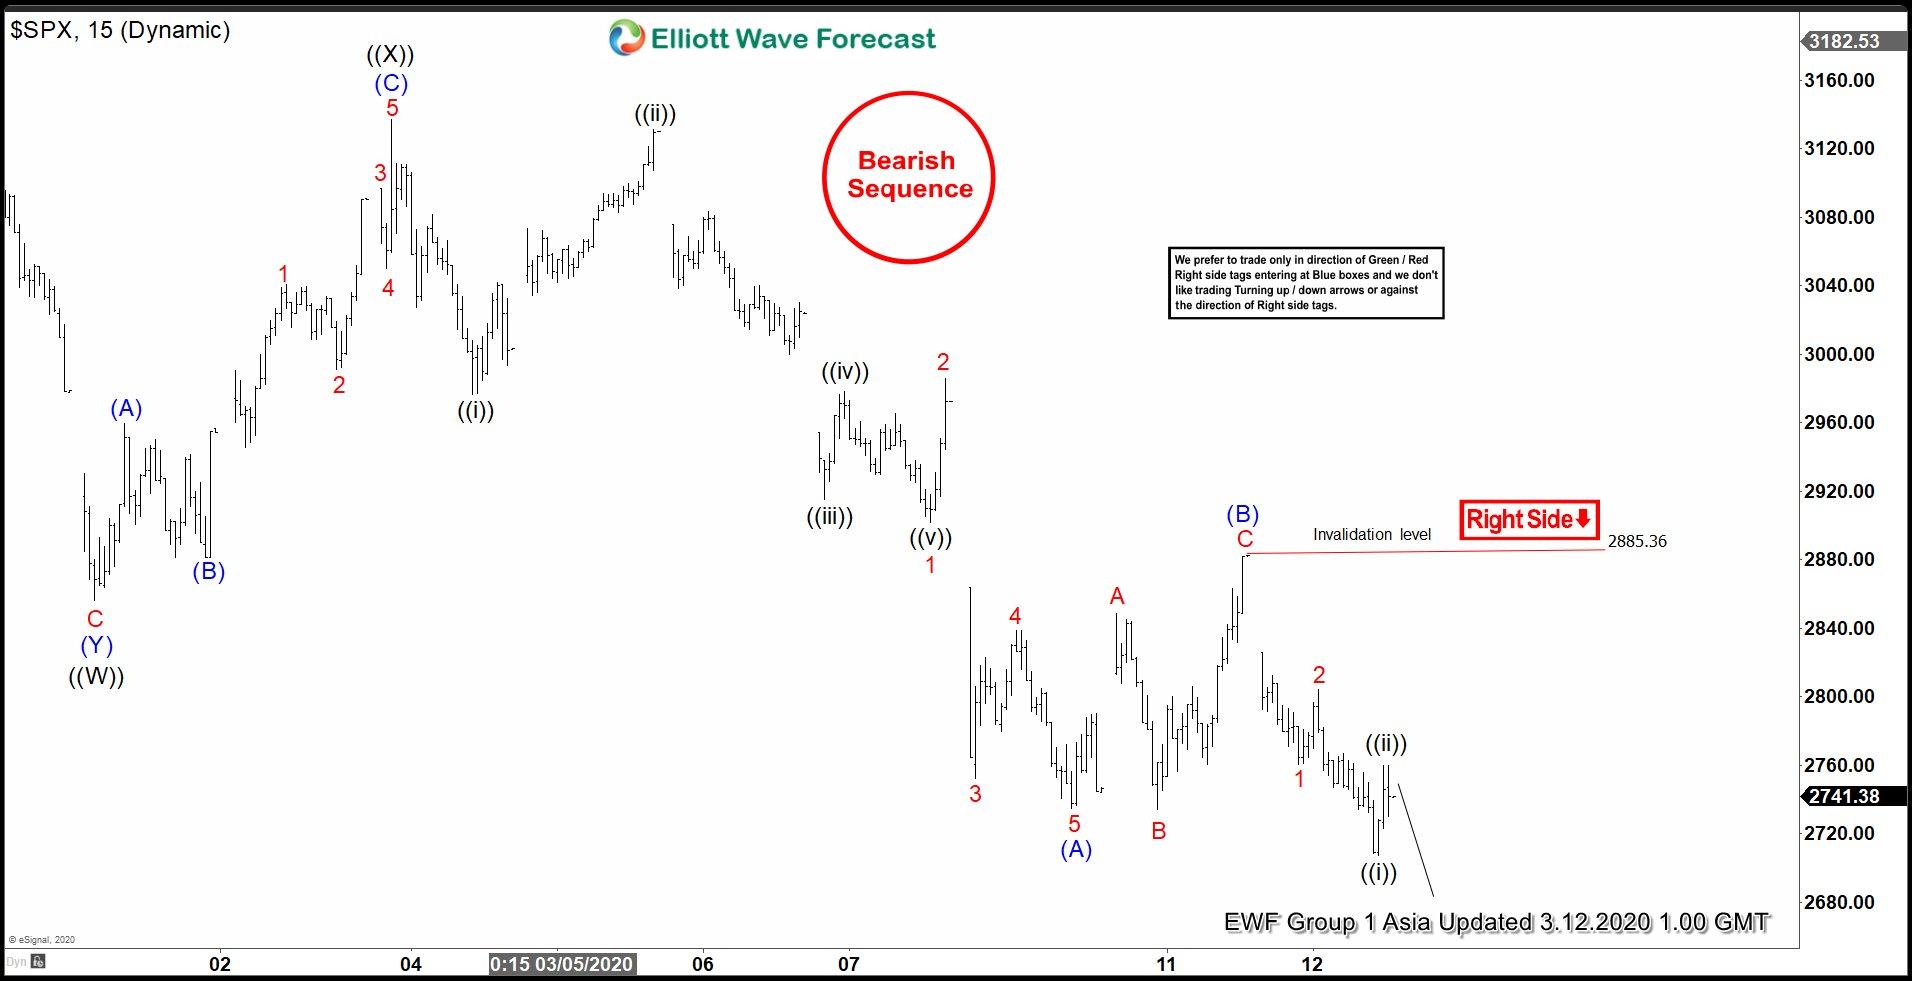 Elliott Wave View : S&P 500 (SPX) Reaching Inflection Area